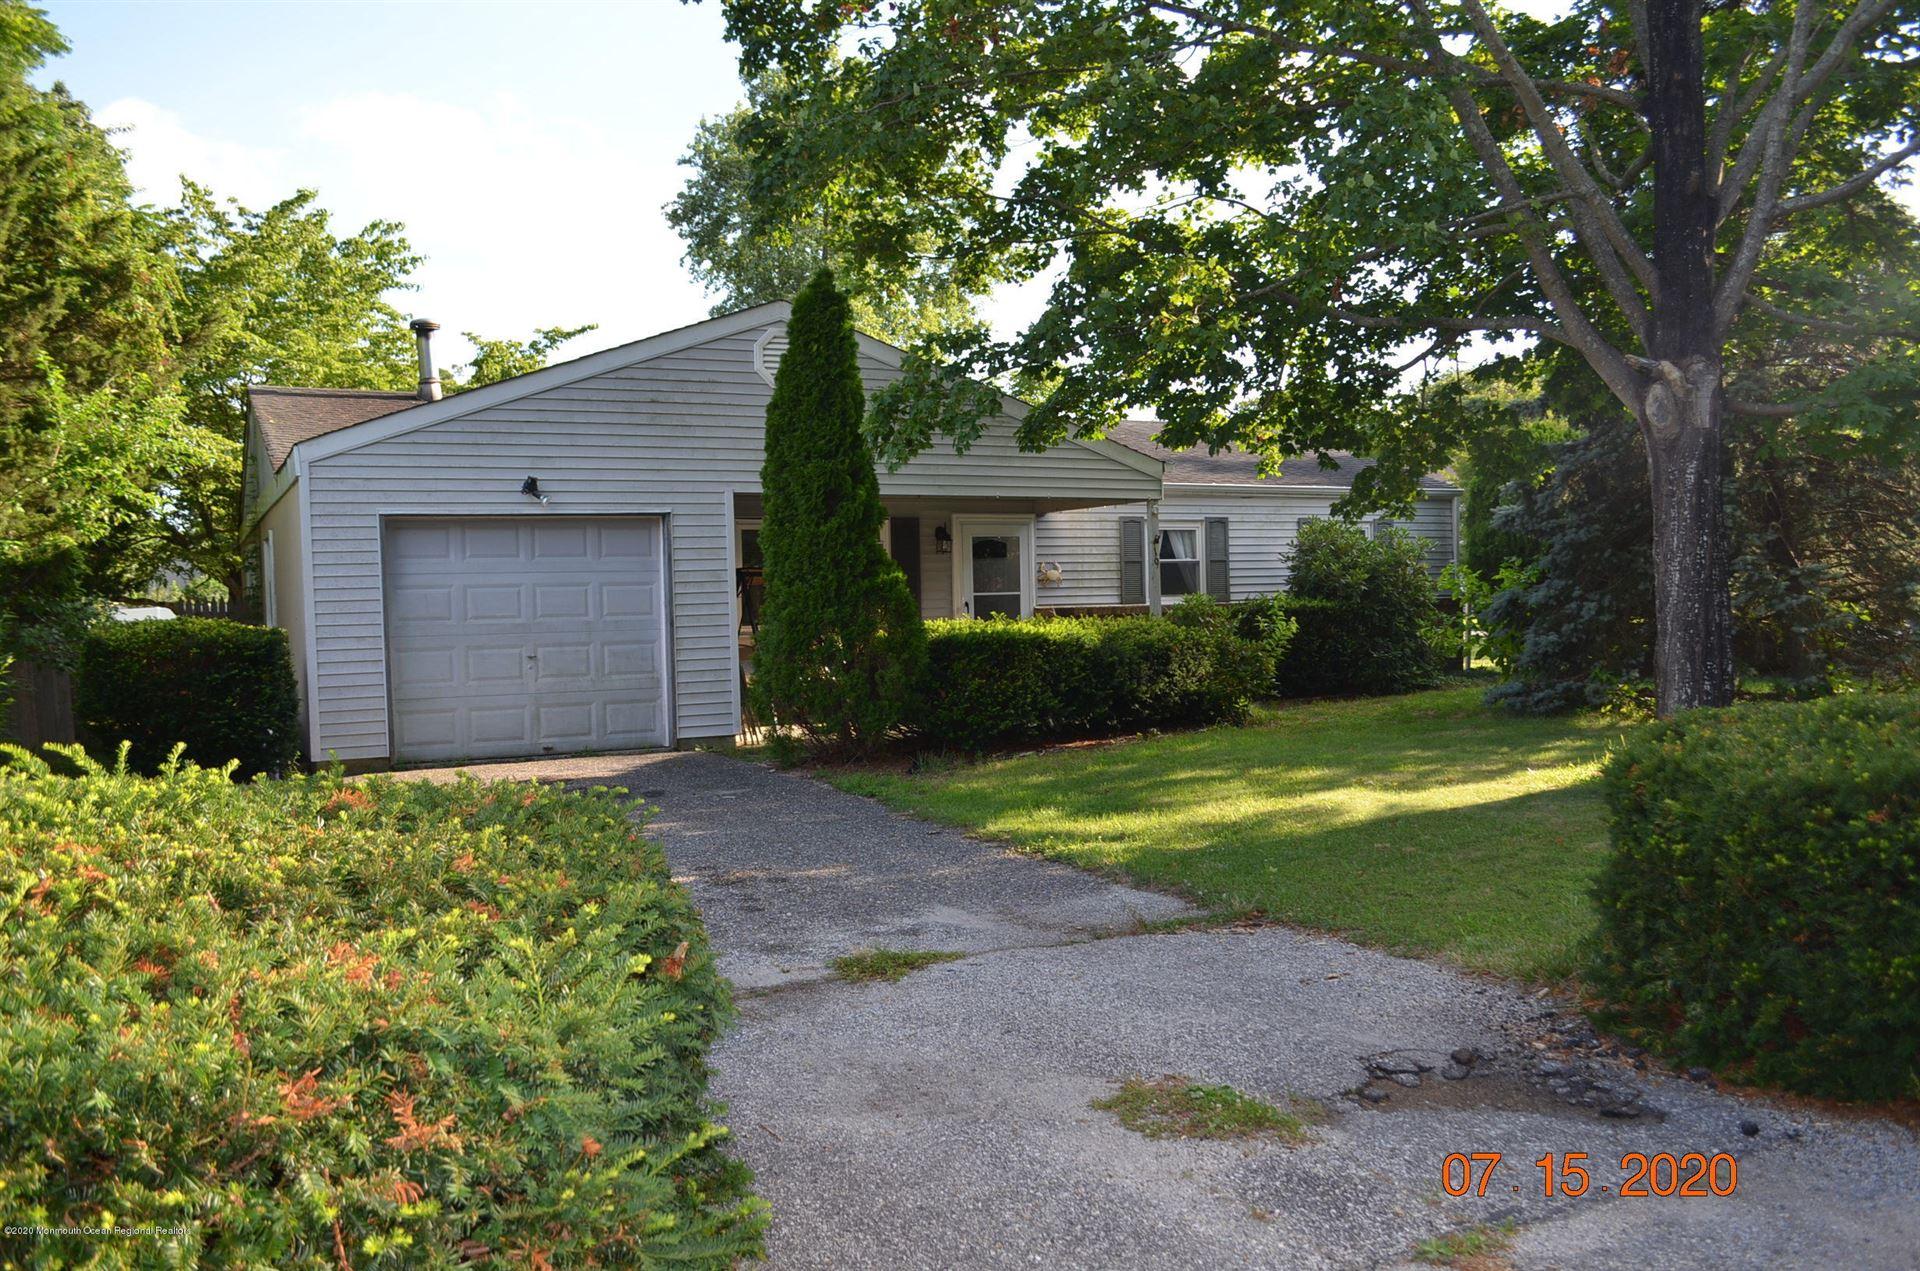 19 Spruce Drive, Little Egg Harbor Township, NJ 08087 - MLS#: 22024659